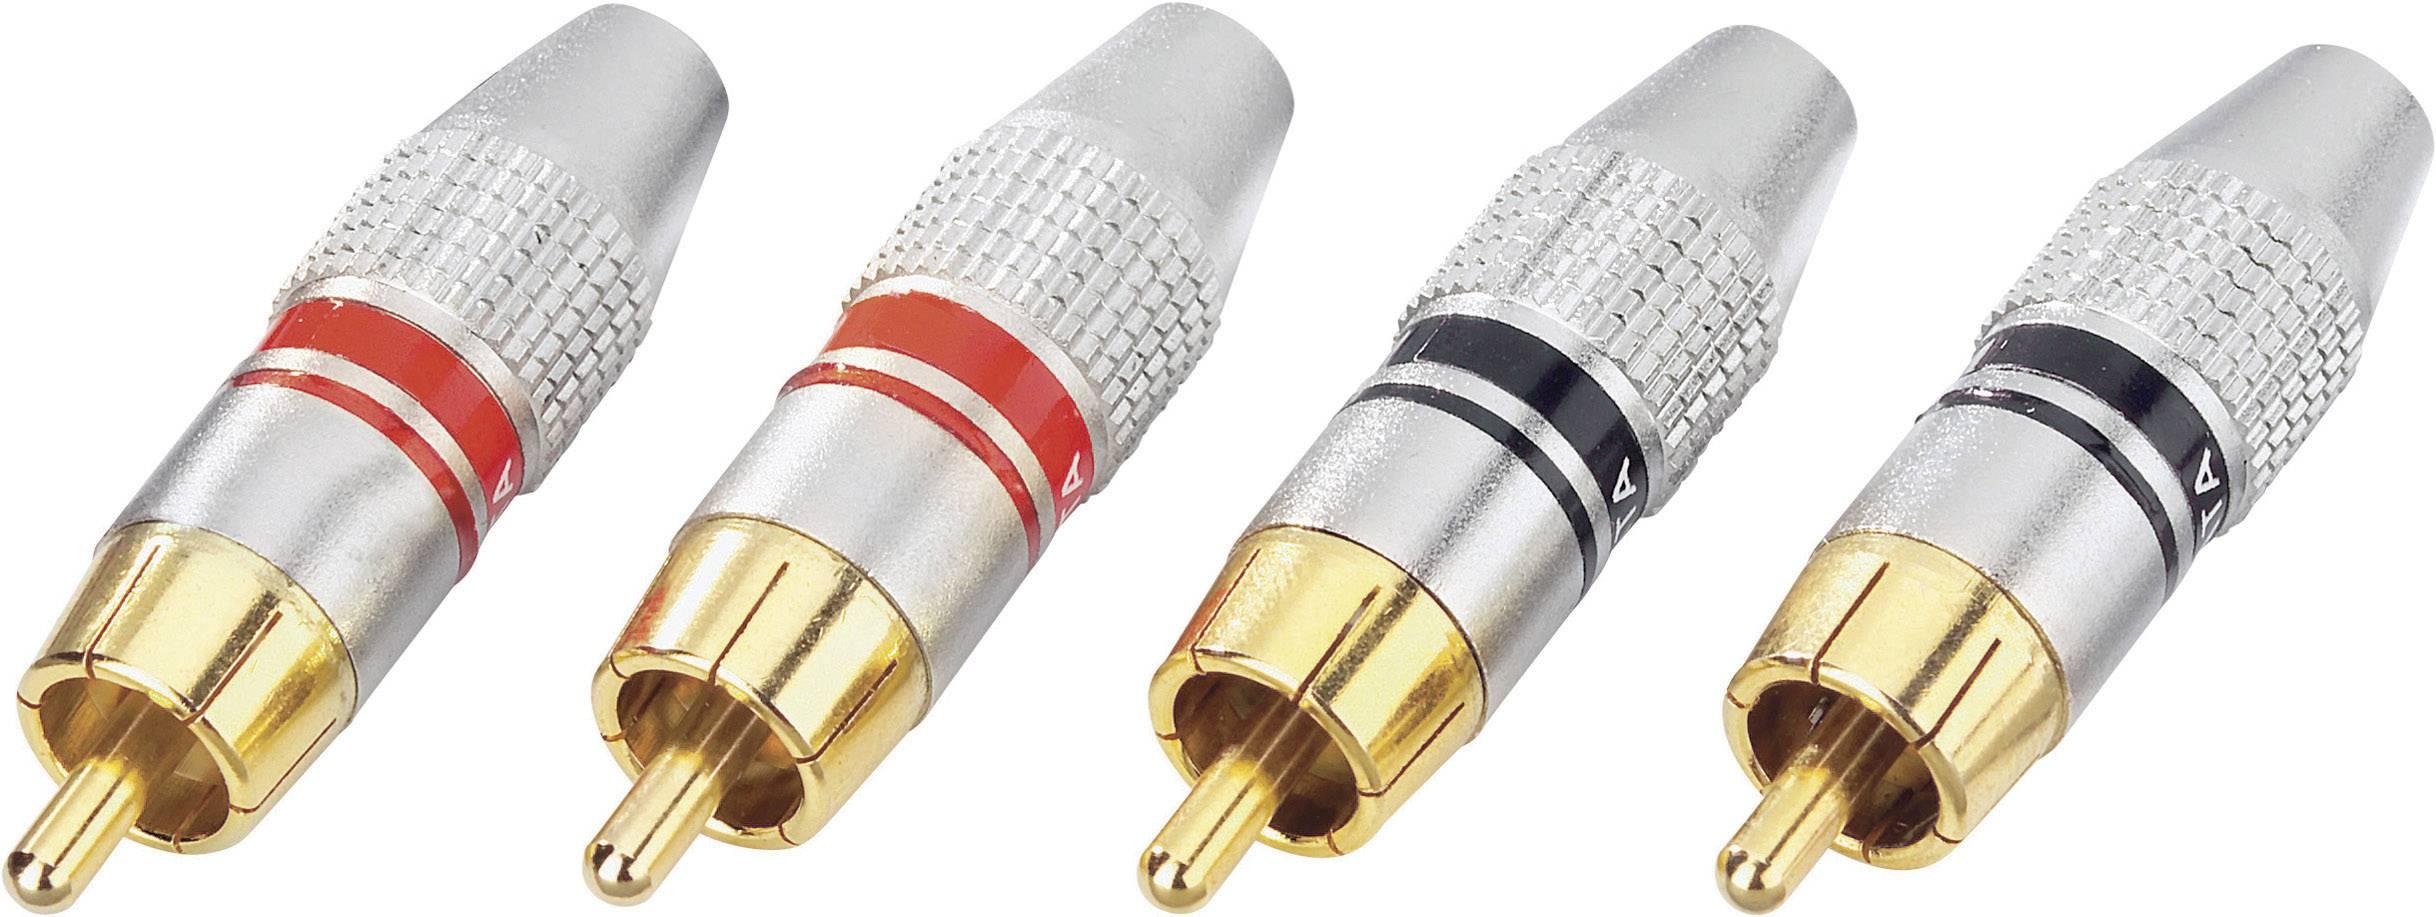 Sada cinch pozlacených konektorů, 2pól., 4 ks